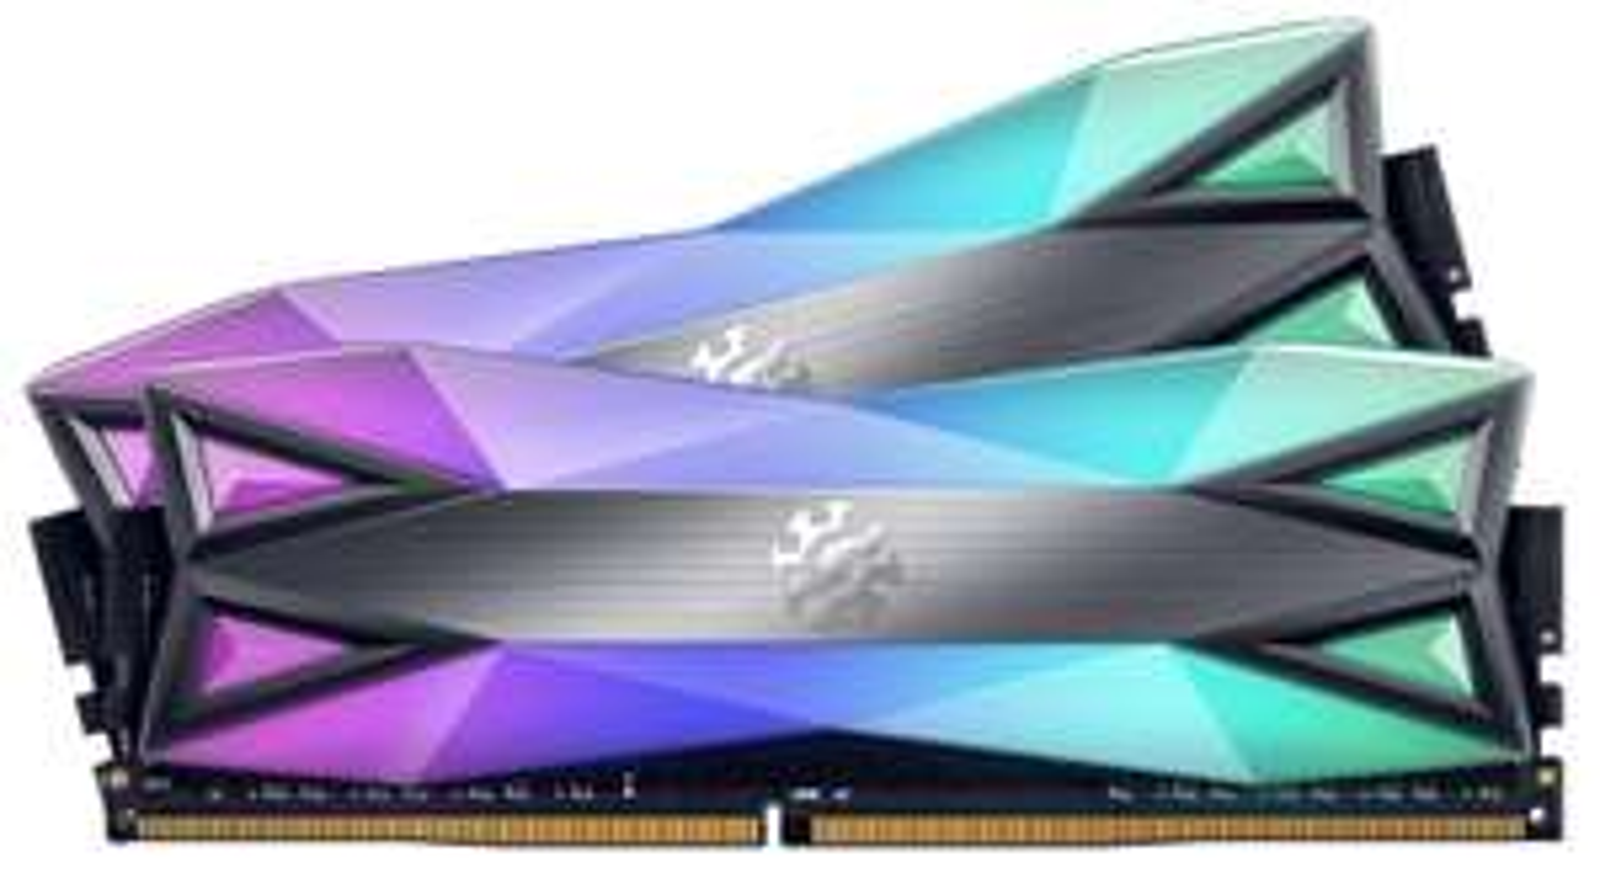 16GB RAM discount offer